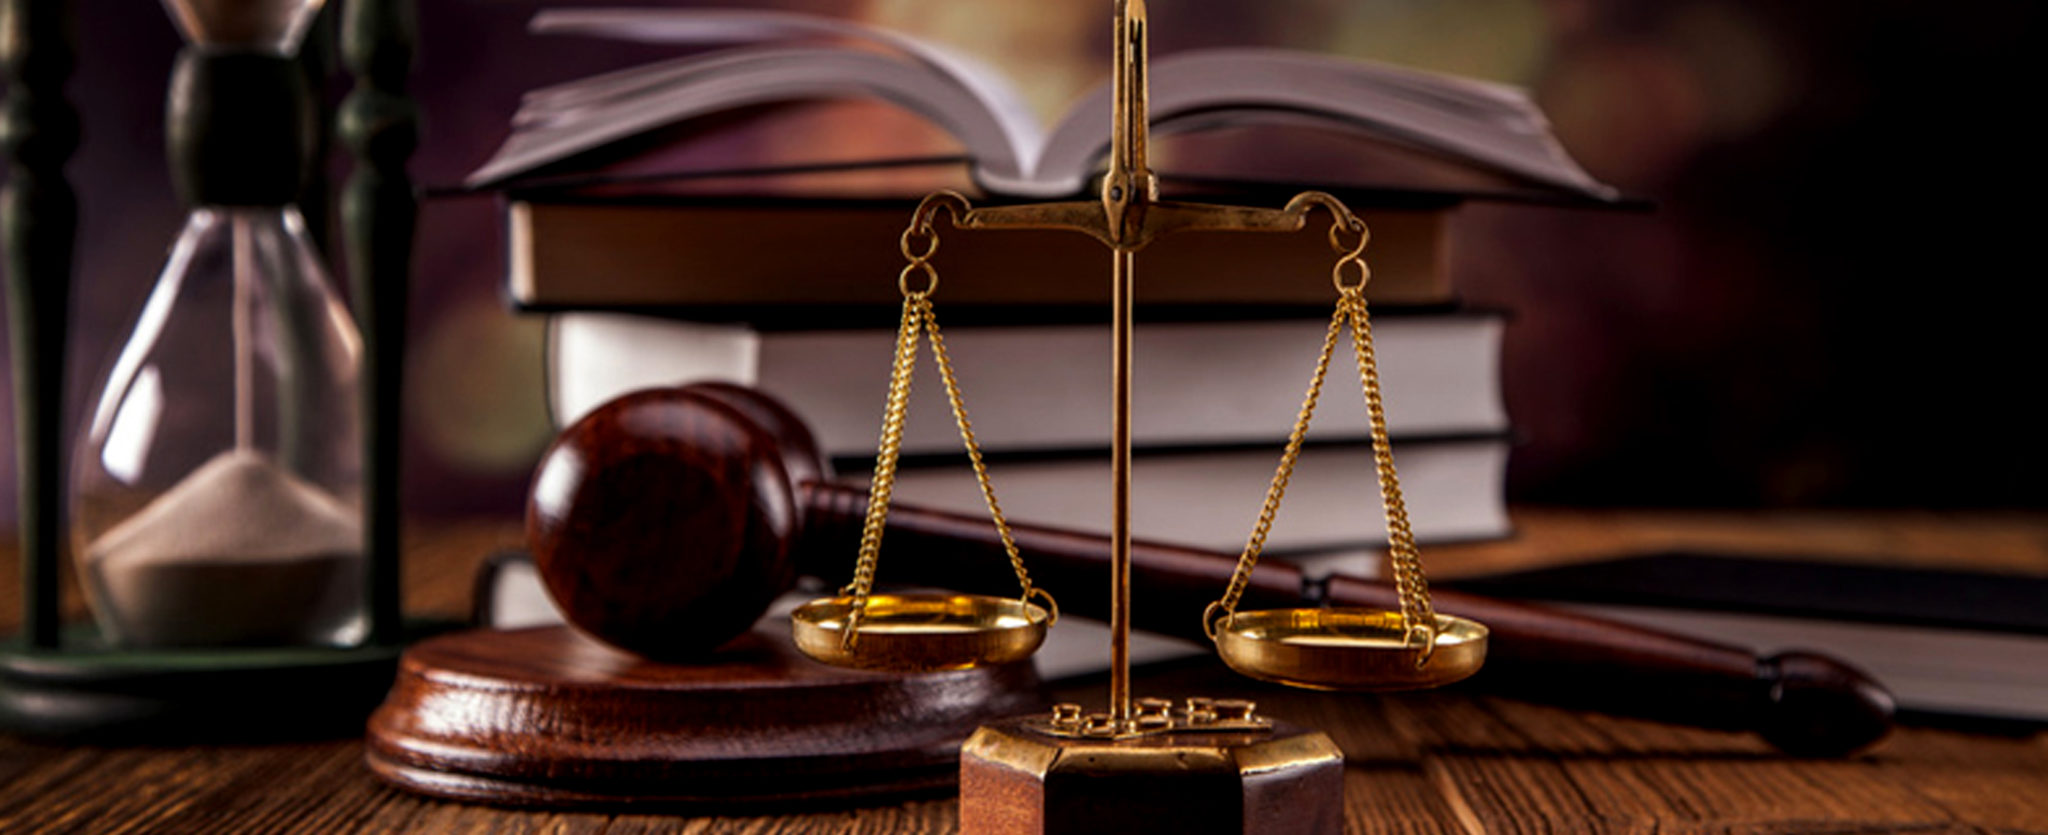 laws in california